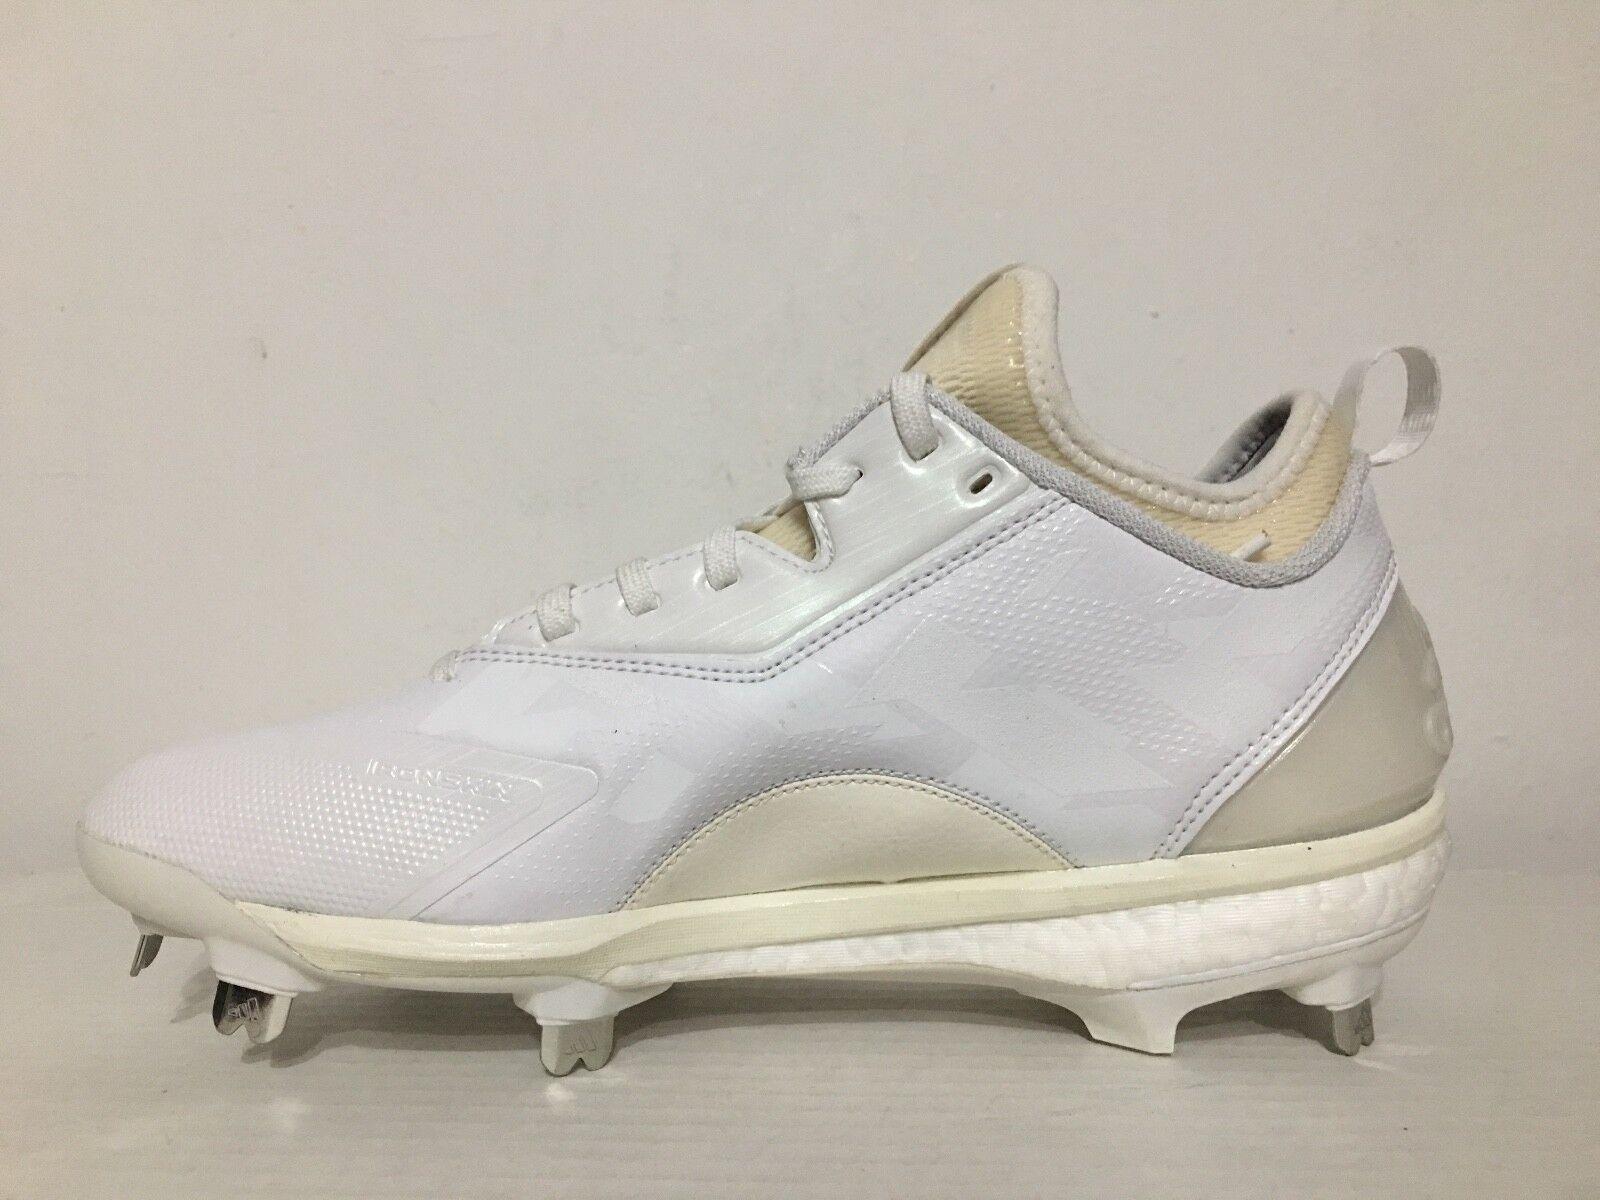 Adidas Stimulant 2 Icon 2 Stimulant 2.0 Métal pour Homme Baseball Cale 4eb4e6